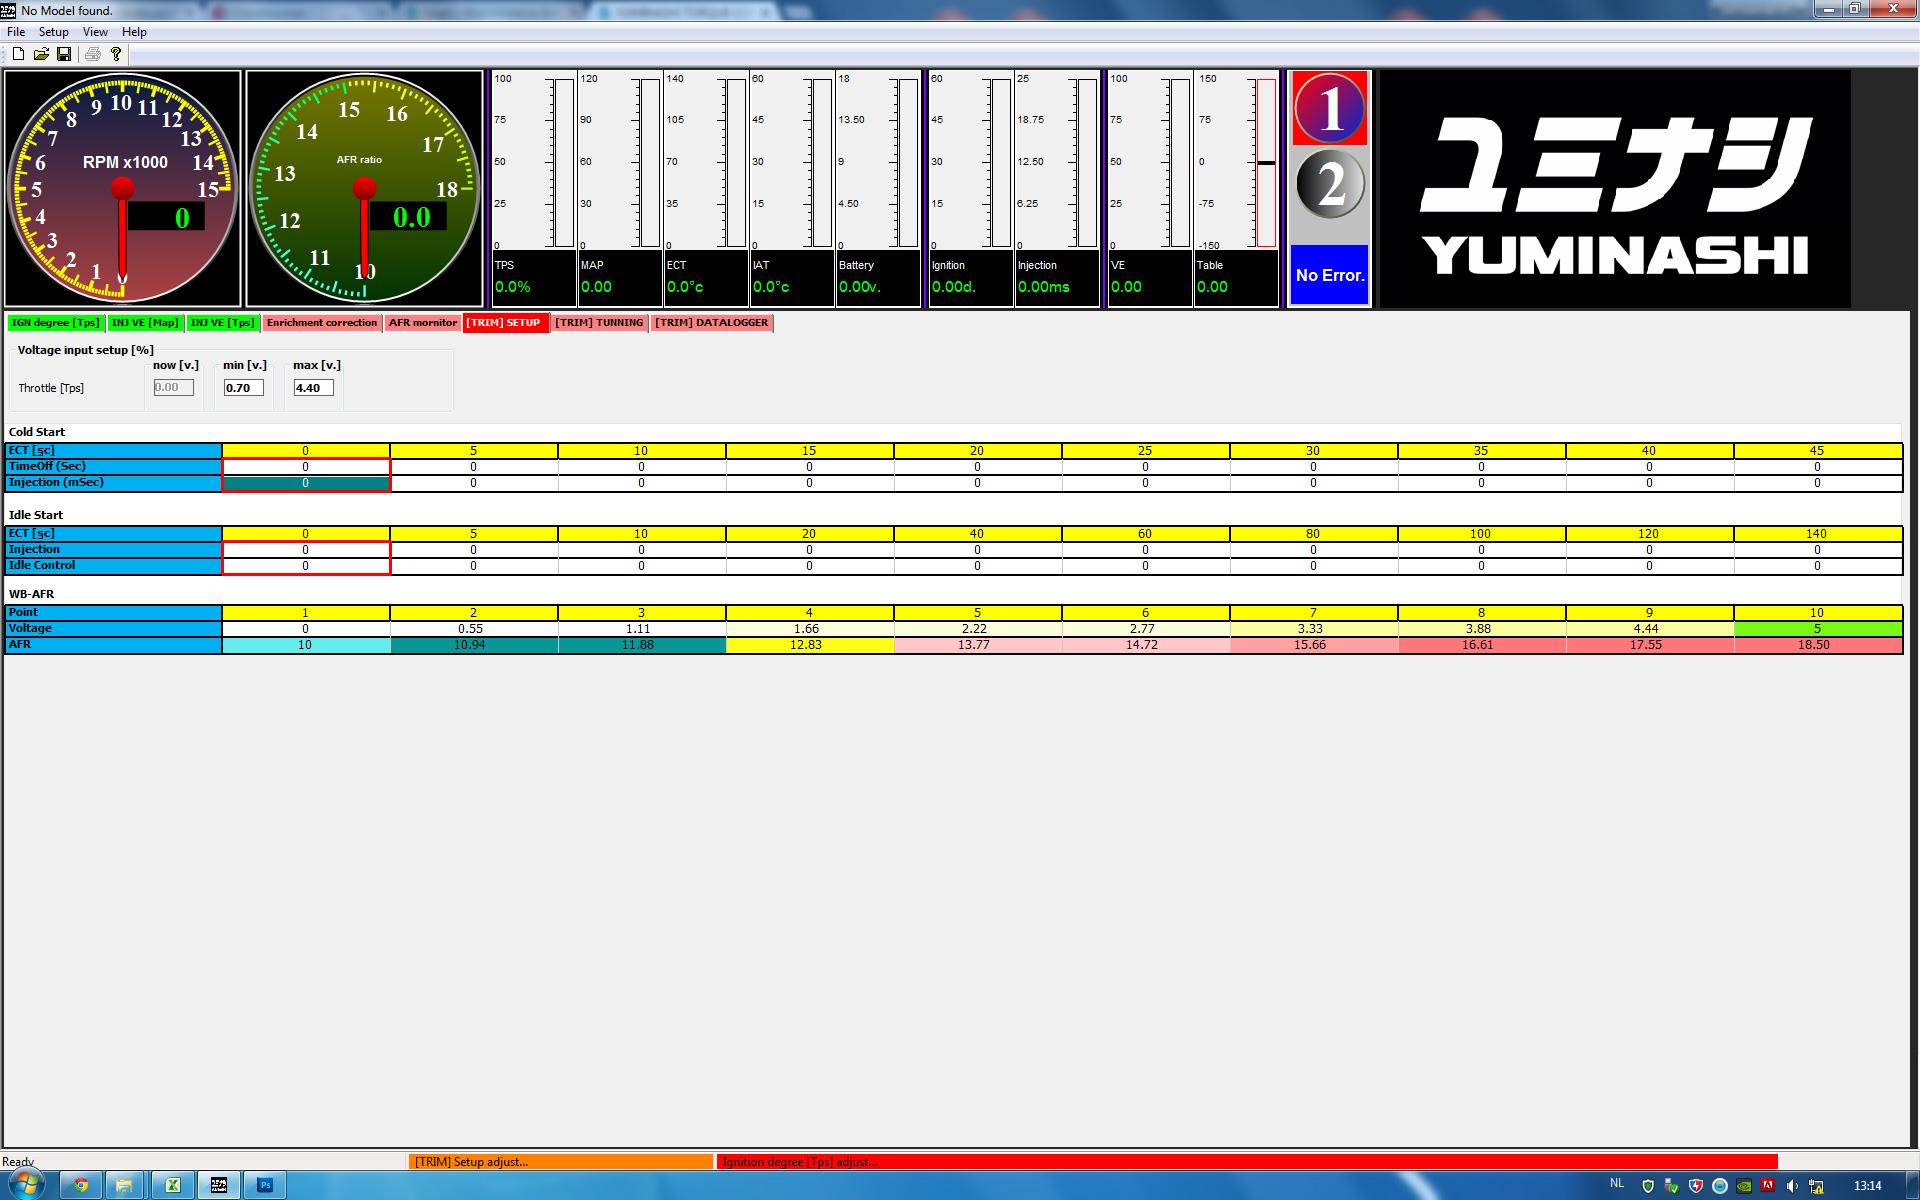 Yuminashi 164cc Ultimate Set Tuning Maps - Honda Grom Forum